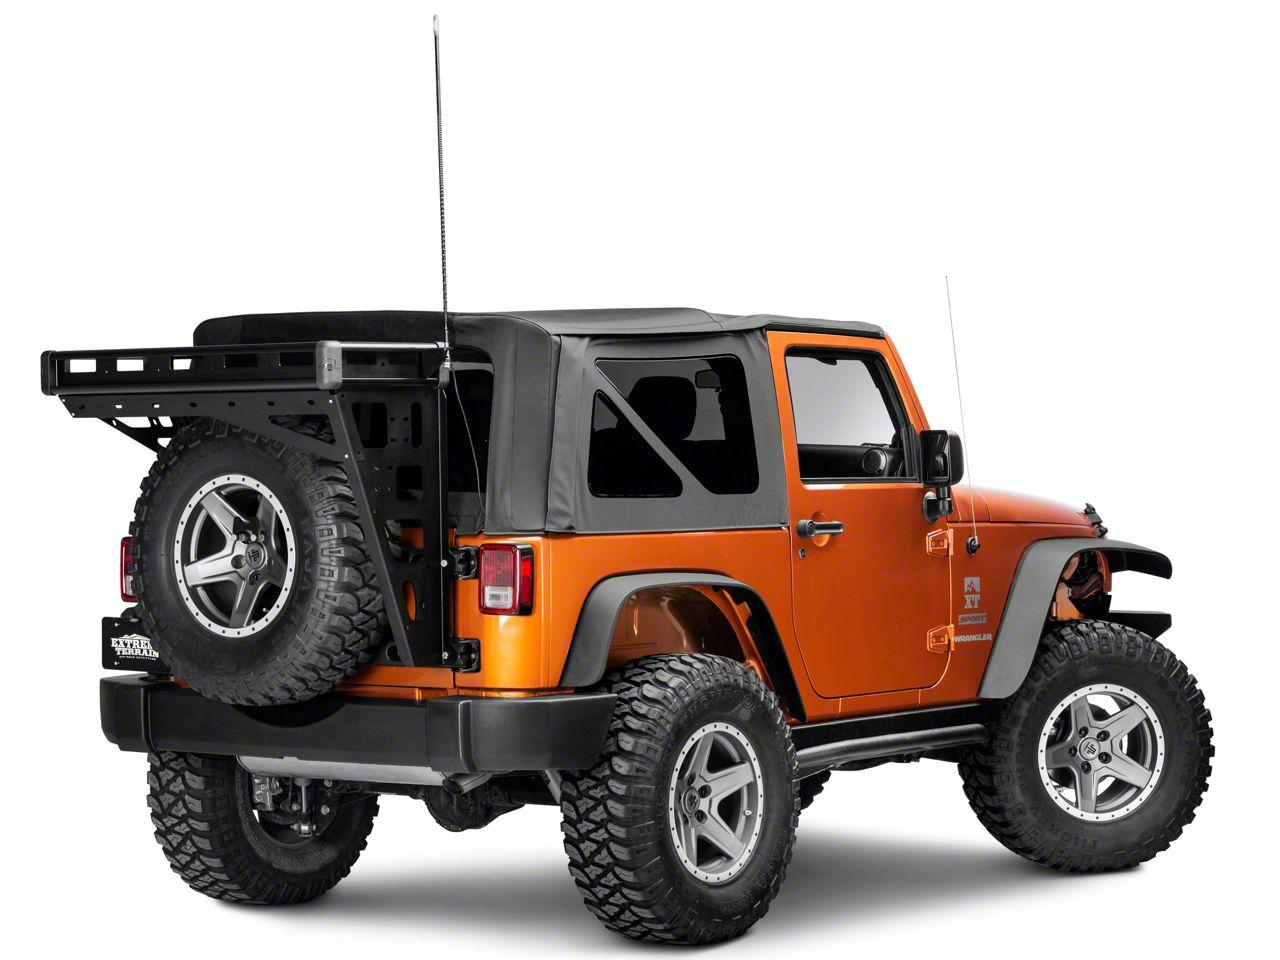 Teraflex Alta Cargo Rack CB Antenna Mount Kit (07 18 Jeep Wrangler JK)  $28.49